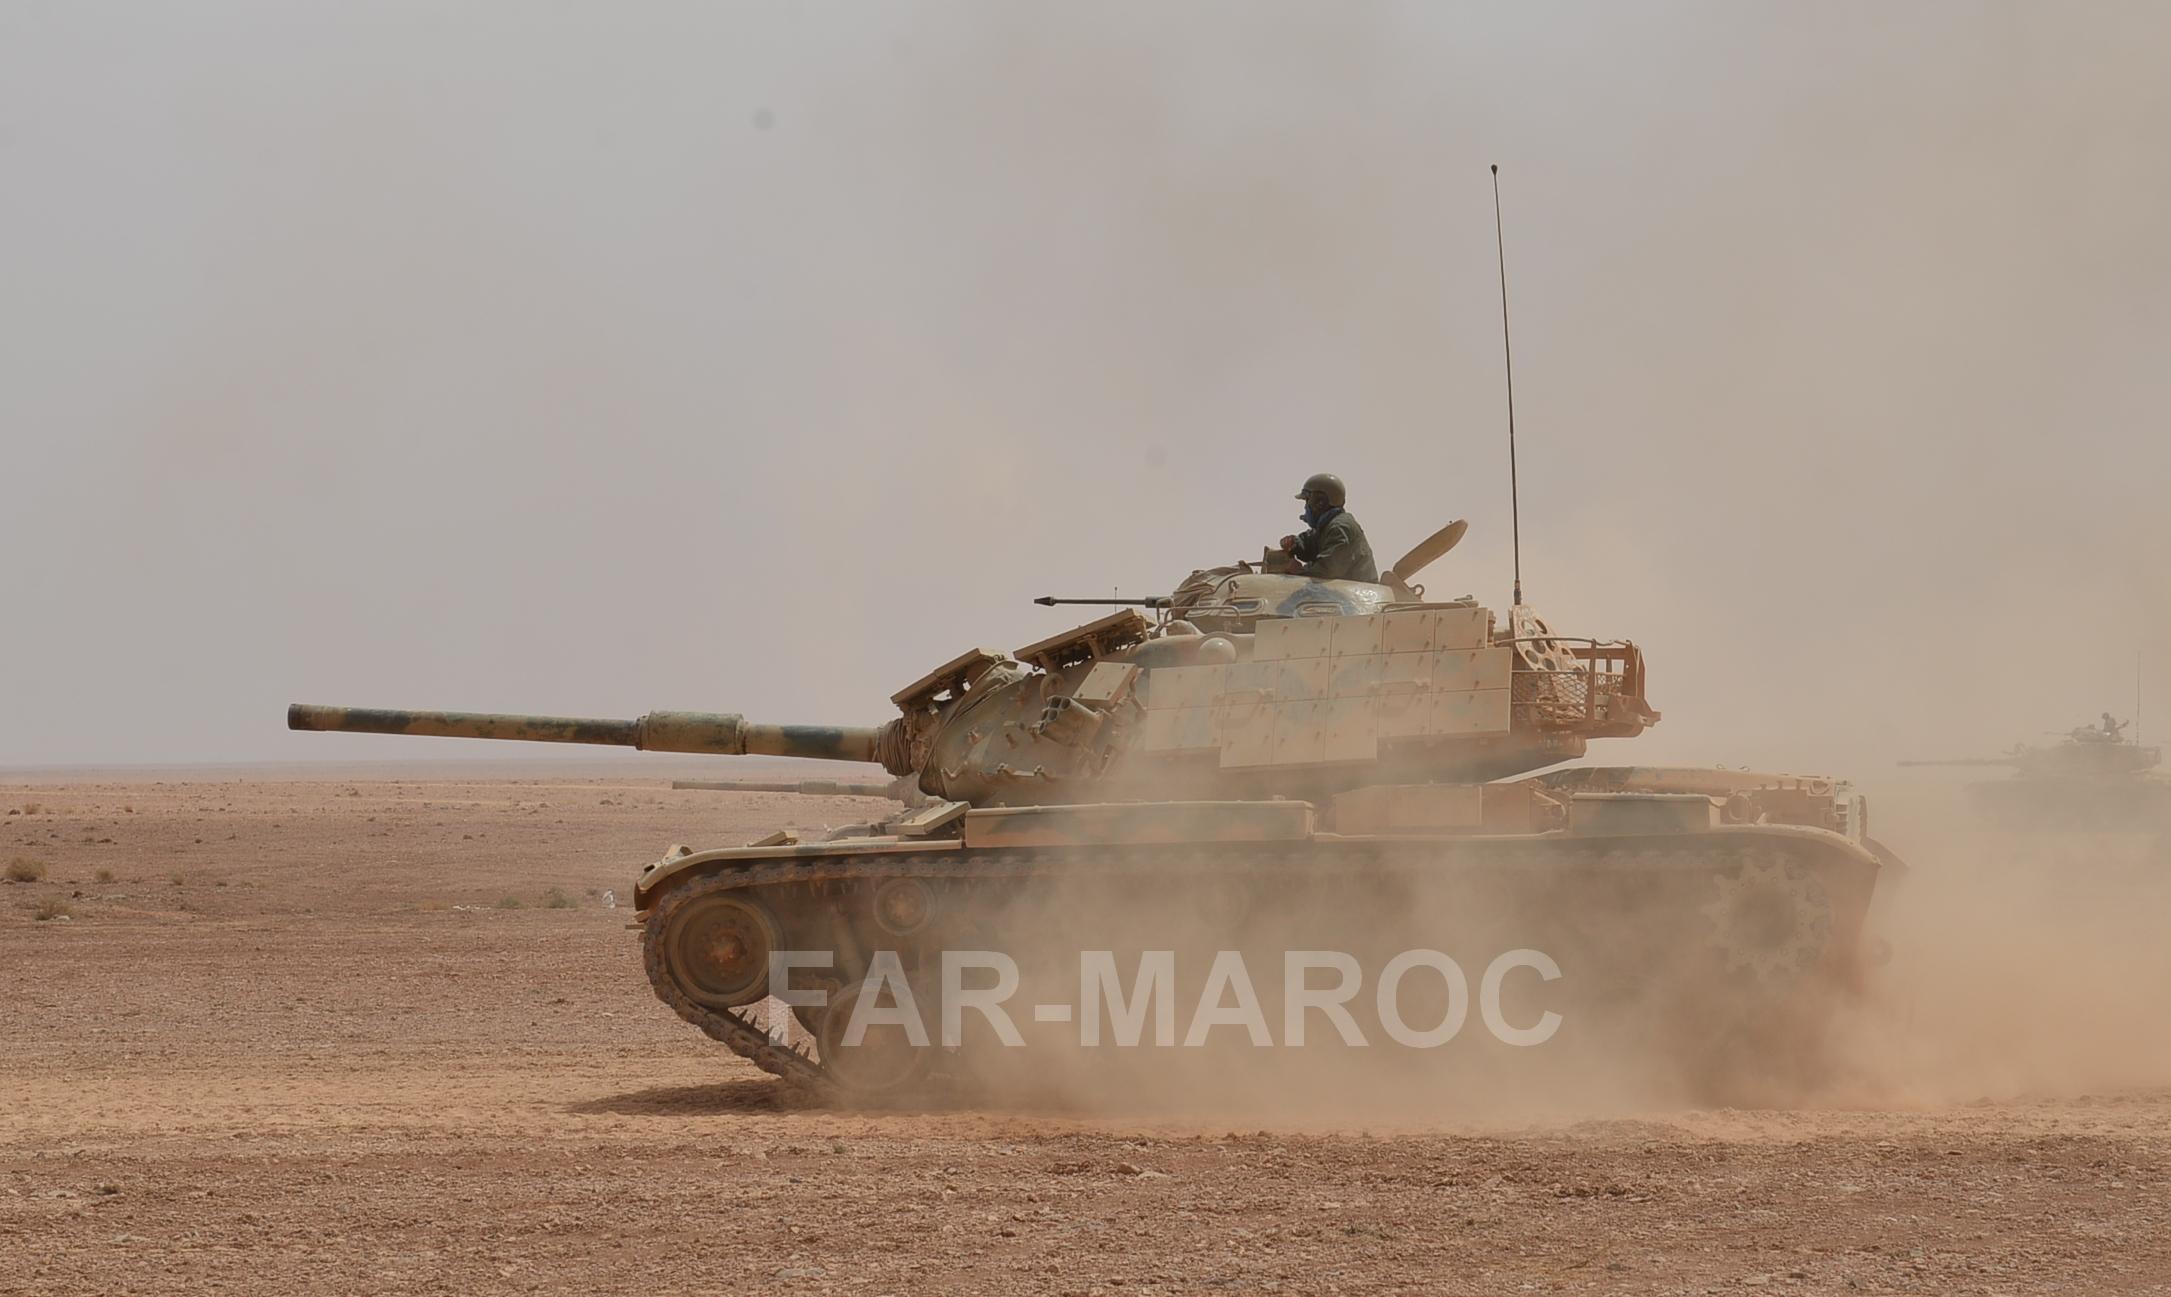 M60 Patton dans les FAR / Moroccan Army M60 Patton - Page 15 49358230221_6514f7fb04_o